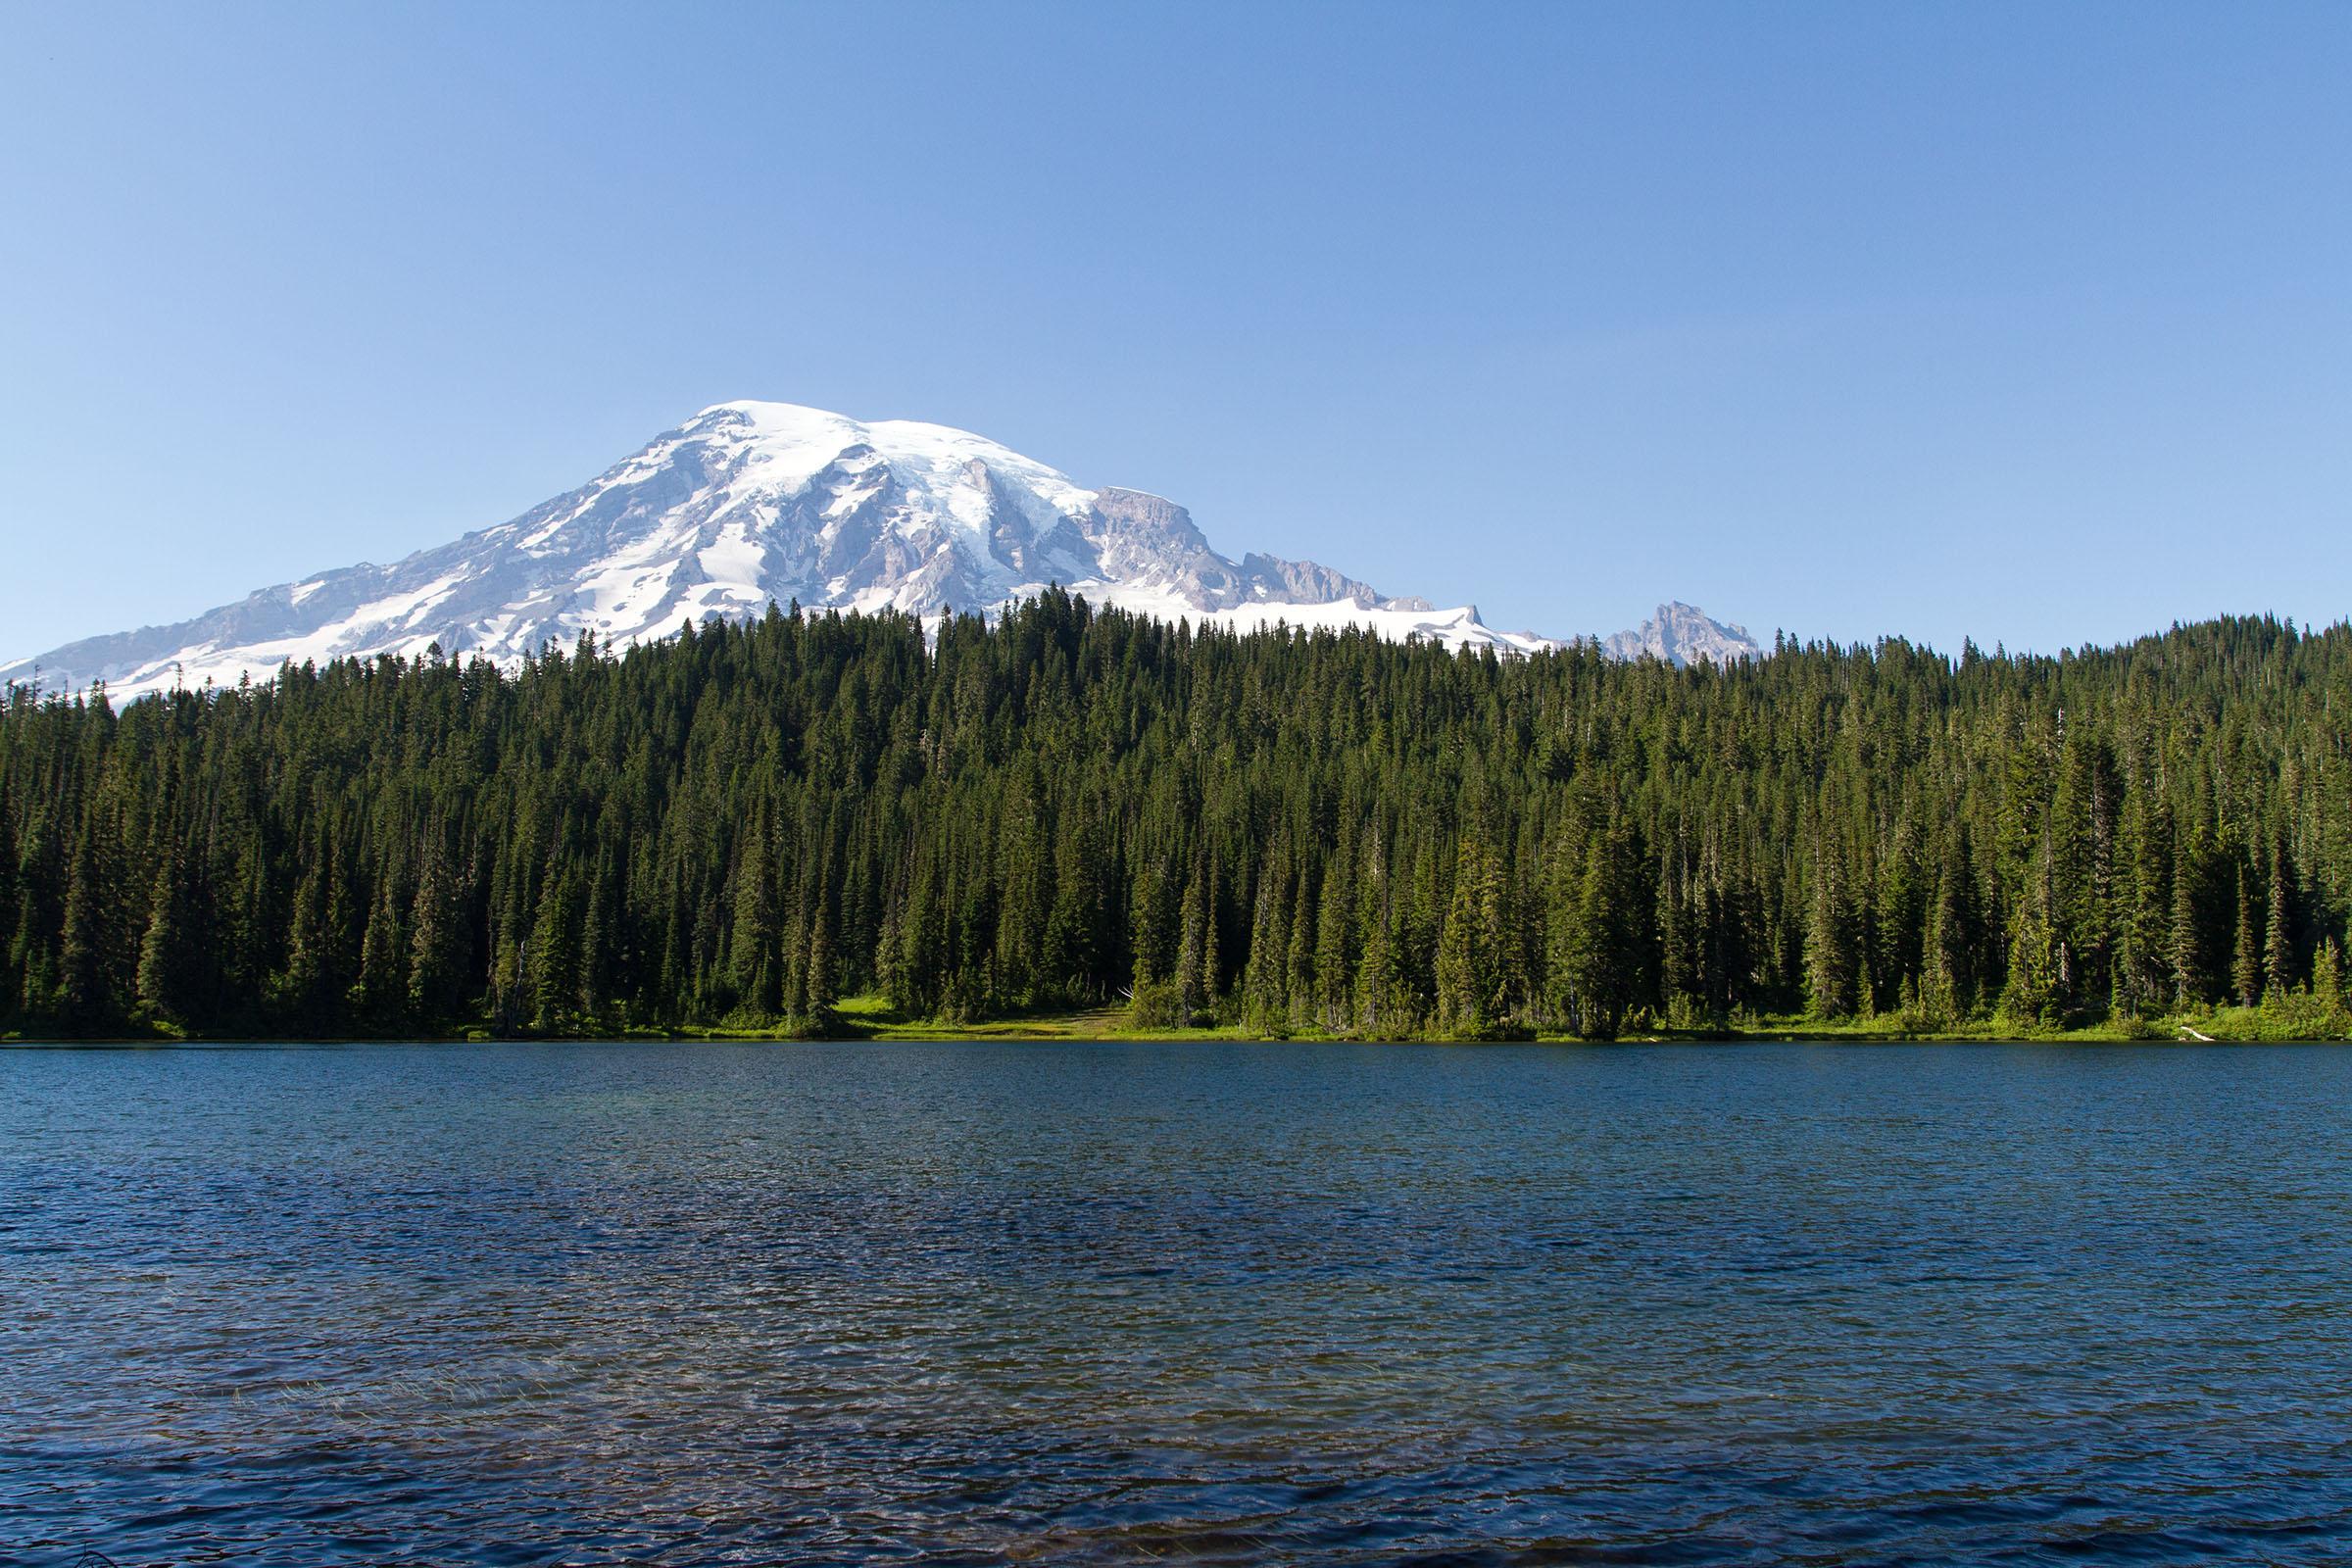 Mount Rainer, Washington., Alpine, Snow, Park, Path, HQ Photo